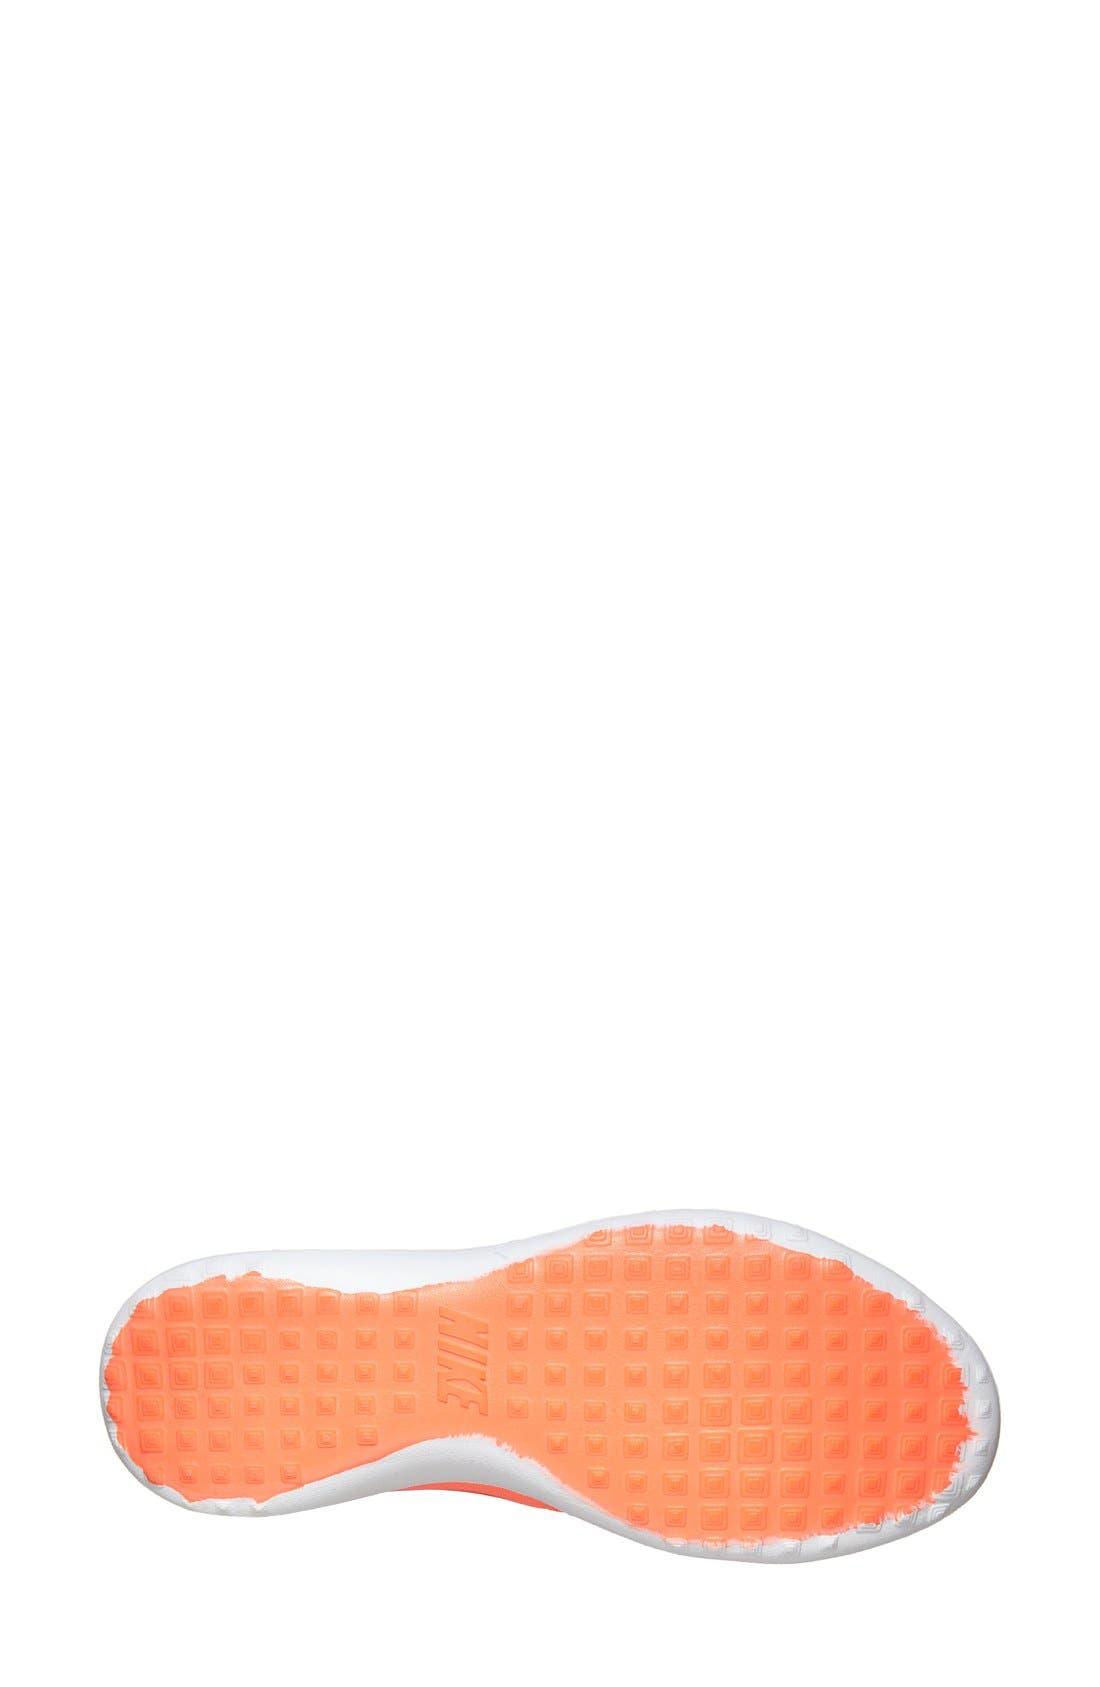 Juvenate Sneaker,                             Alternate thumbnail 201, color,